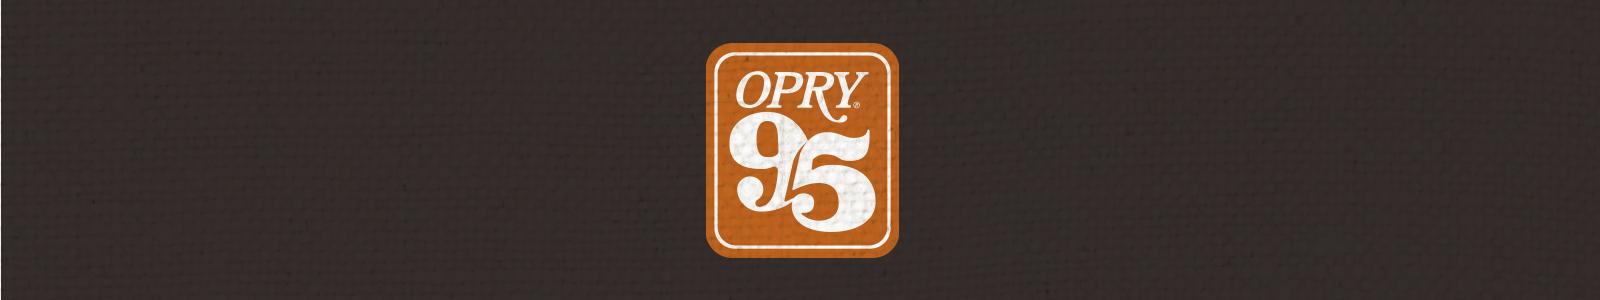 GRAND OLE OPRY - OPRY UPDATE